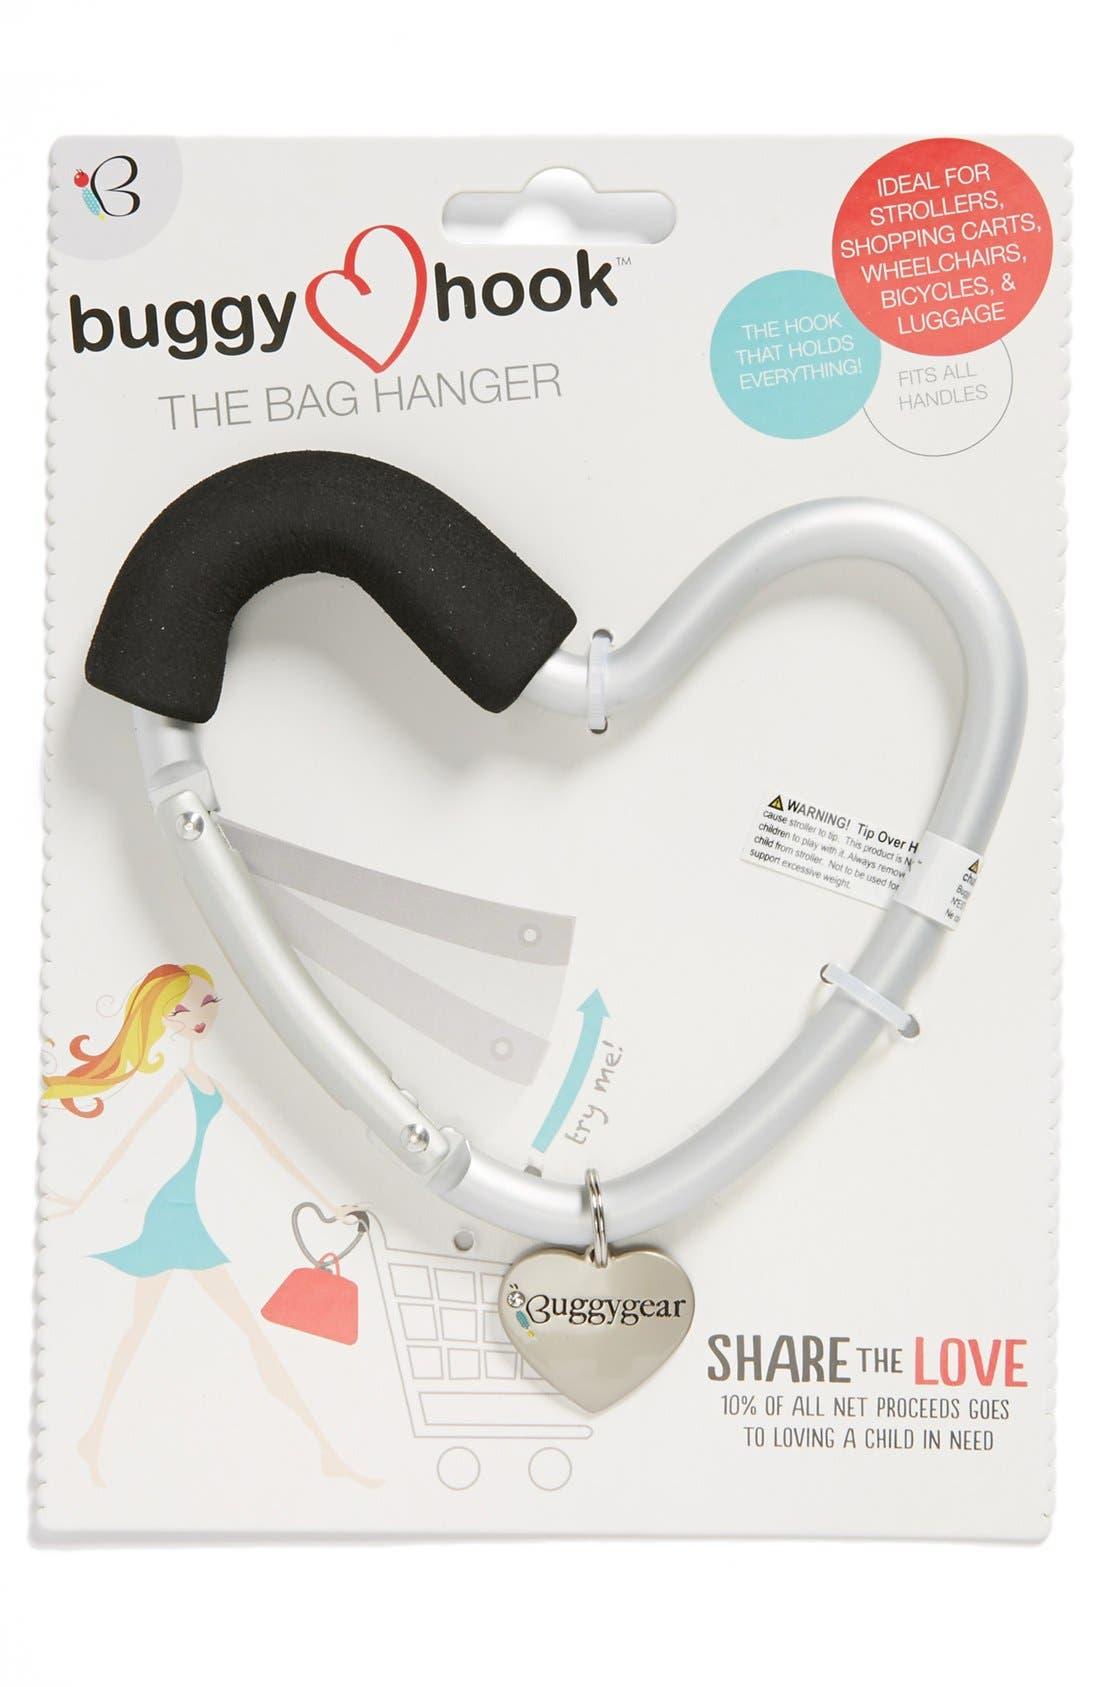 Alternate Image 1 Selected - Buggygear 'Buggy Heart Hook' Stroller Bag Hanger